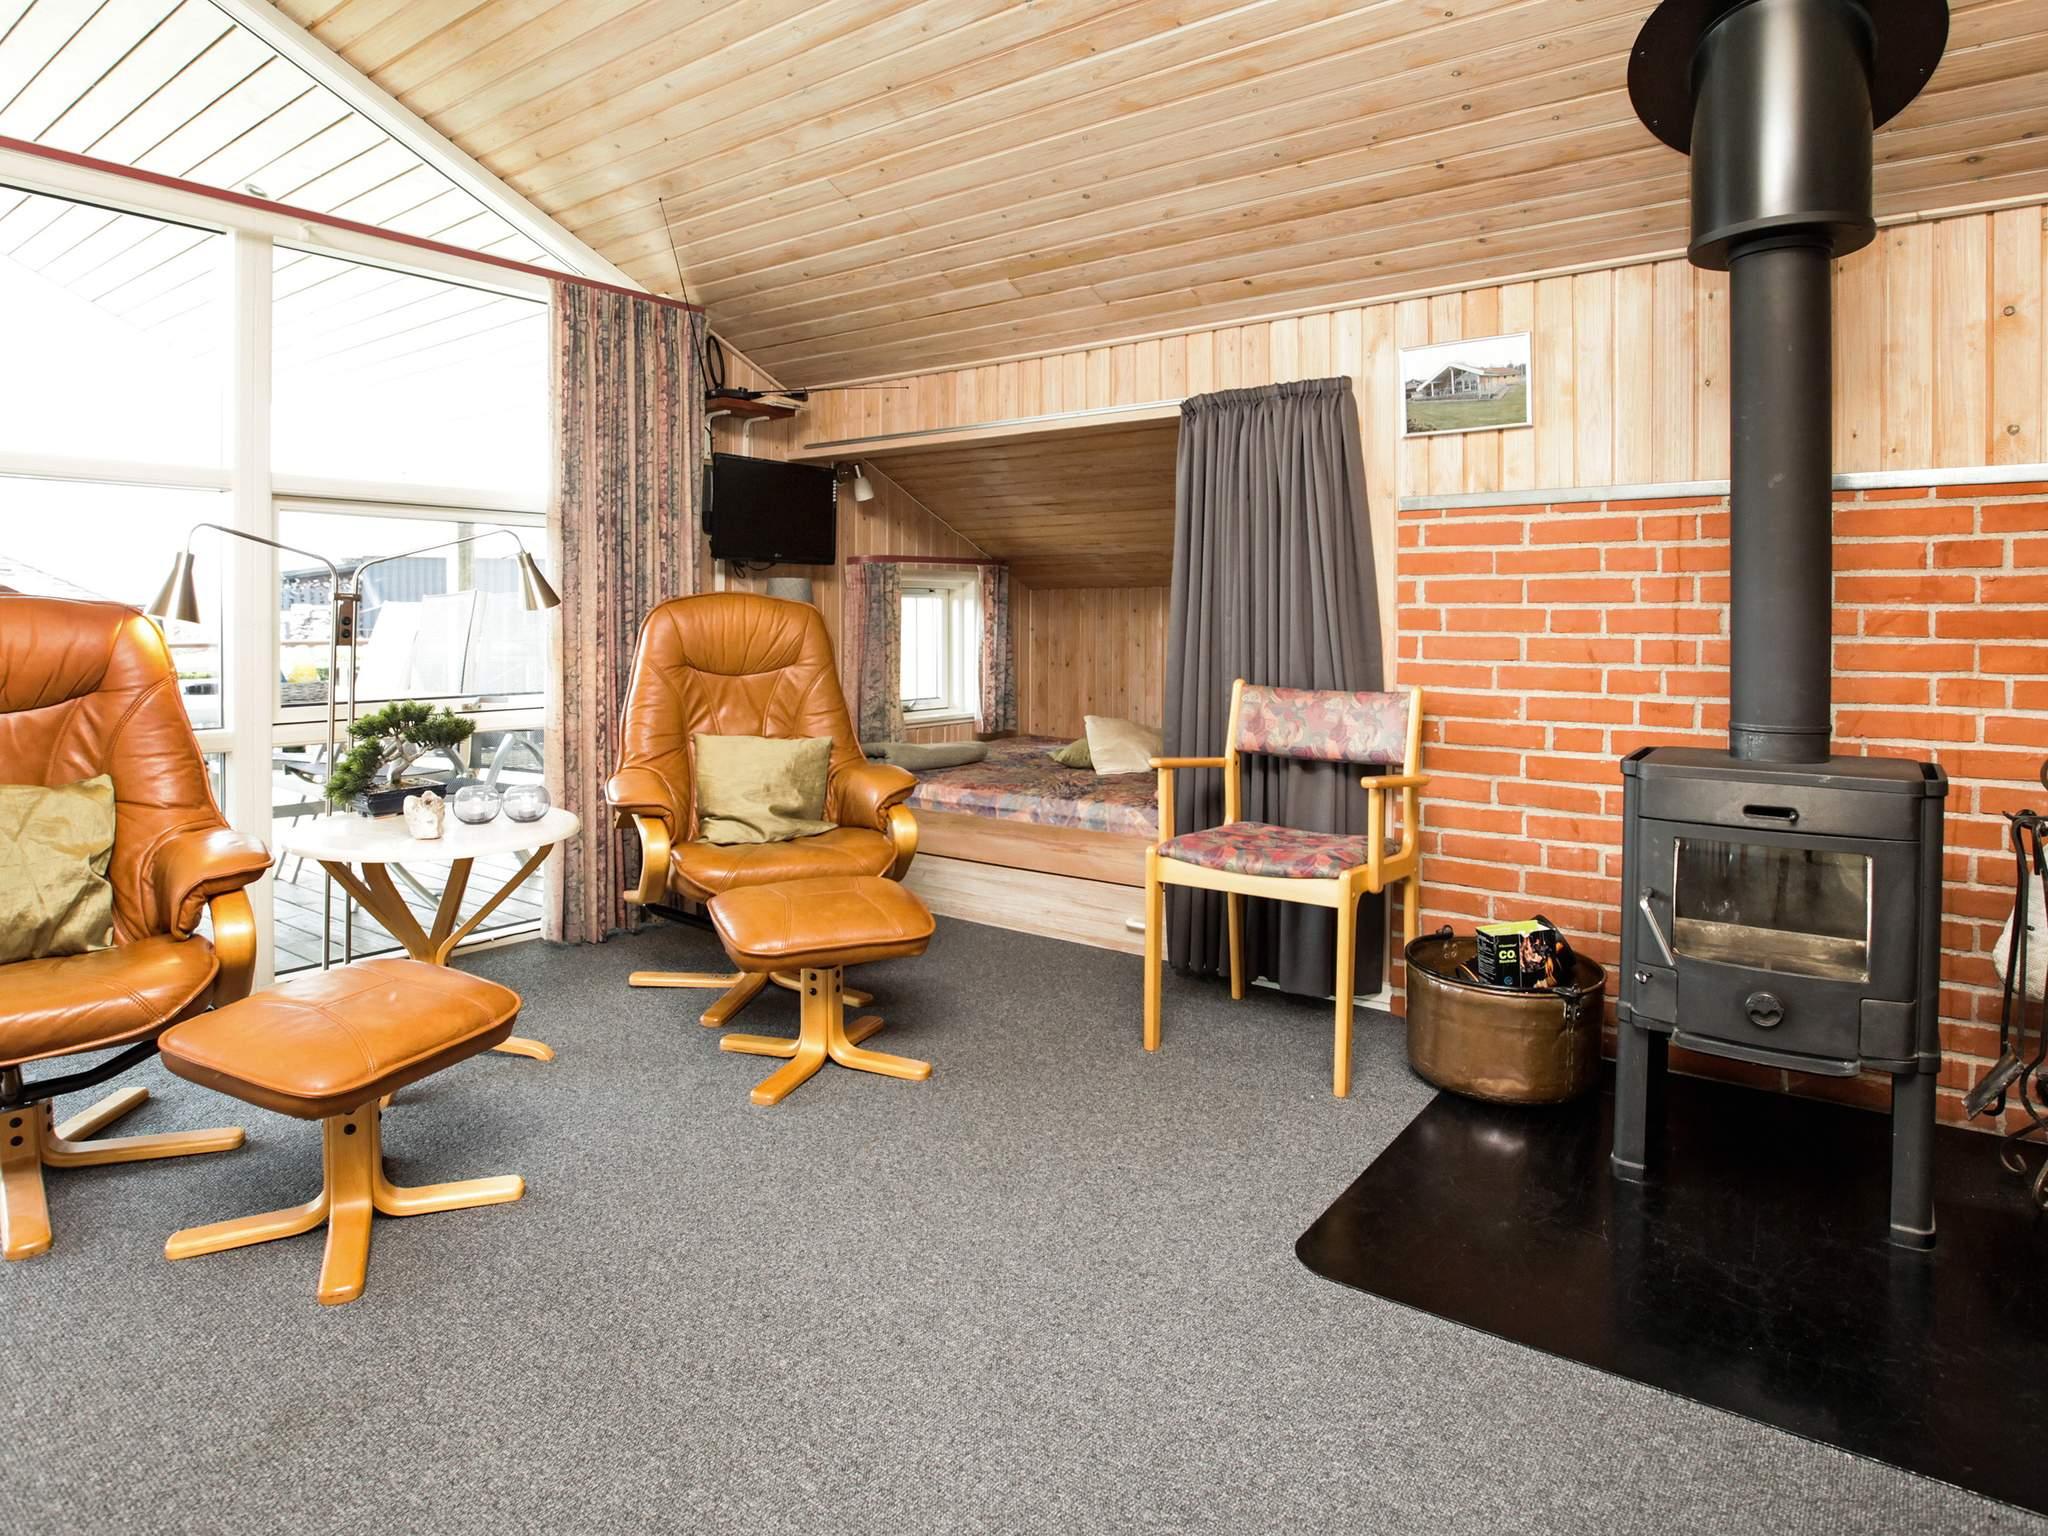 Maison de vacances Falsled (87545), Faldsled, , Fionie, Danemark, image 6